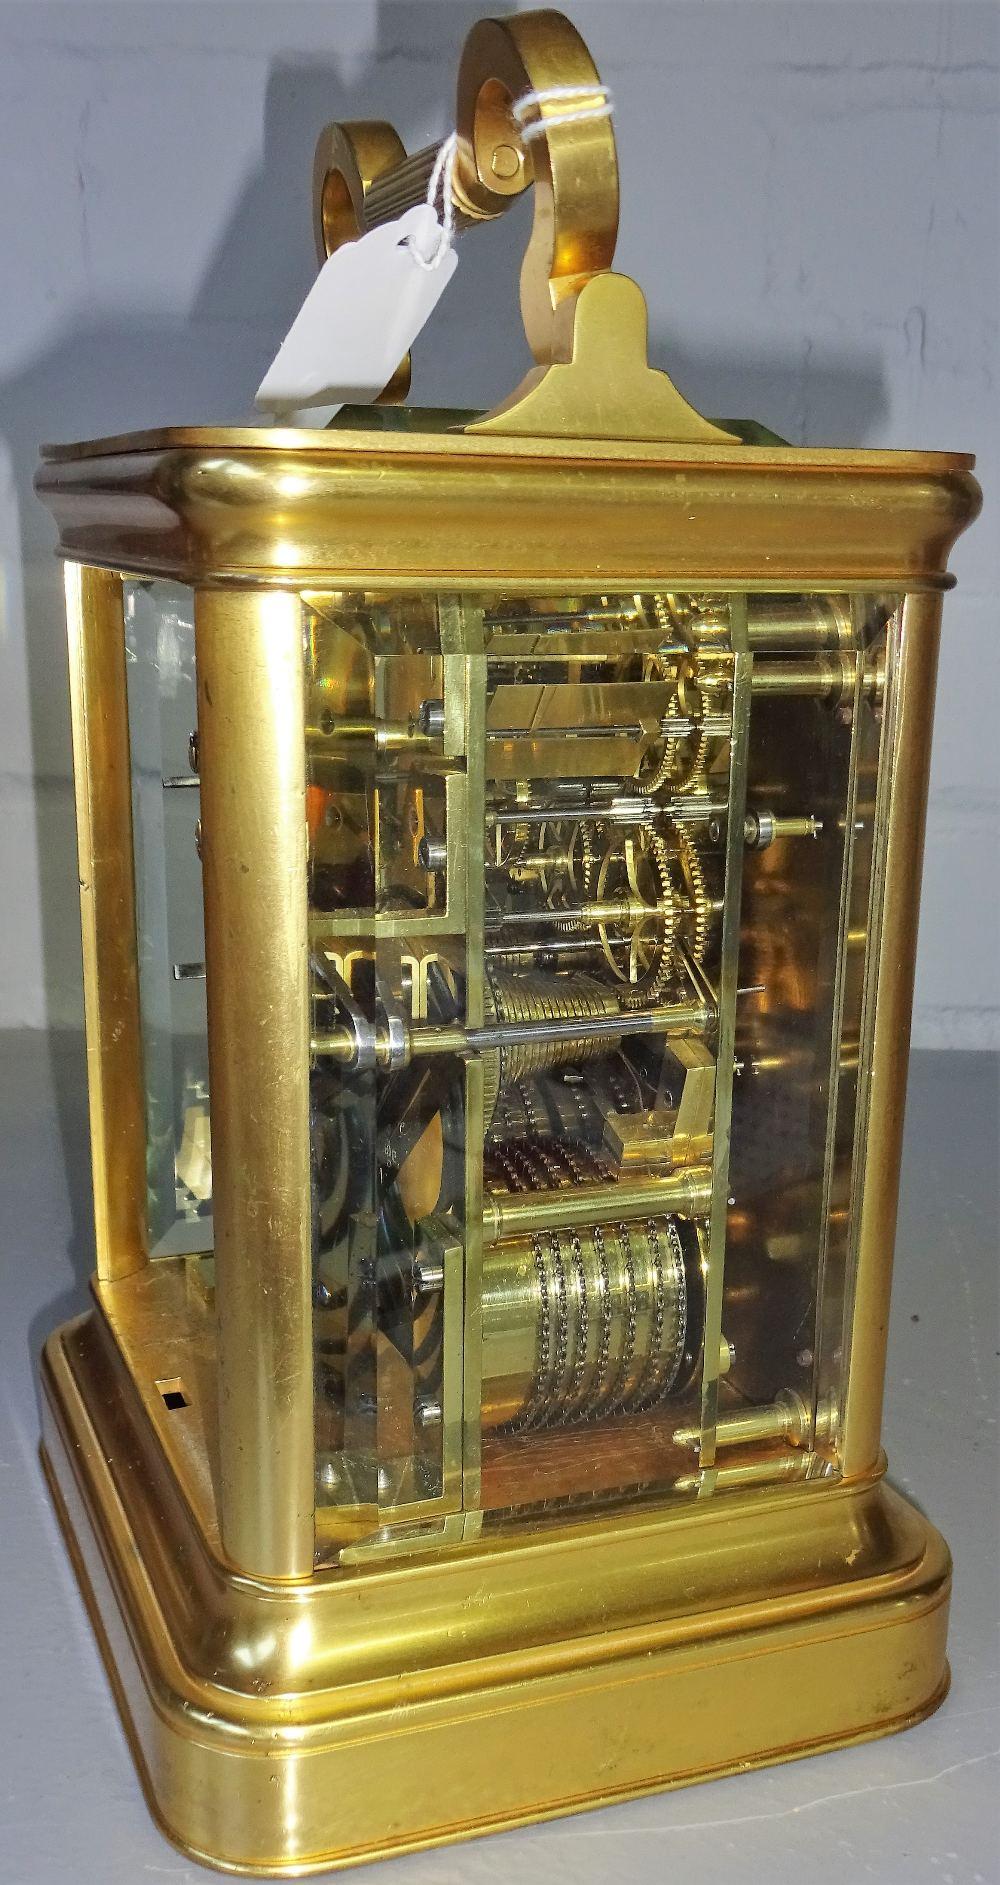 Lot 695 - A Victorian gilt bronze giant striking carriage clock By James McCabe, Royal Exchange, London, No.